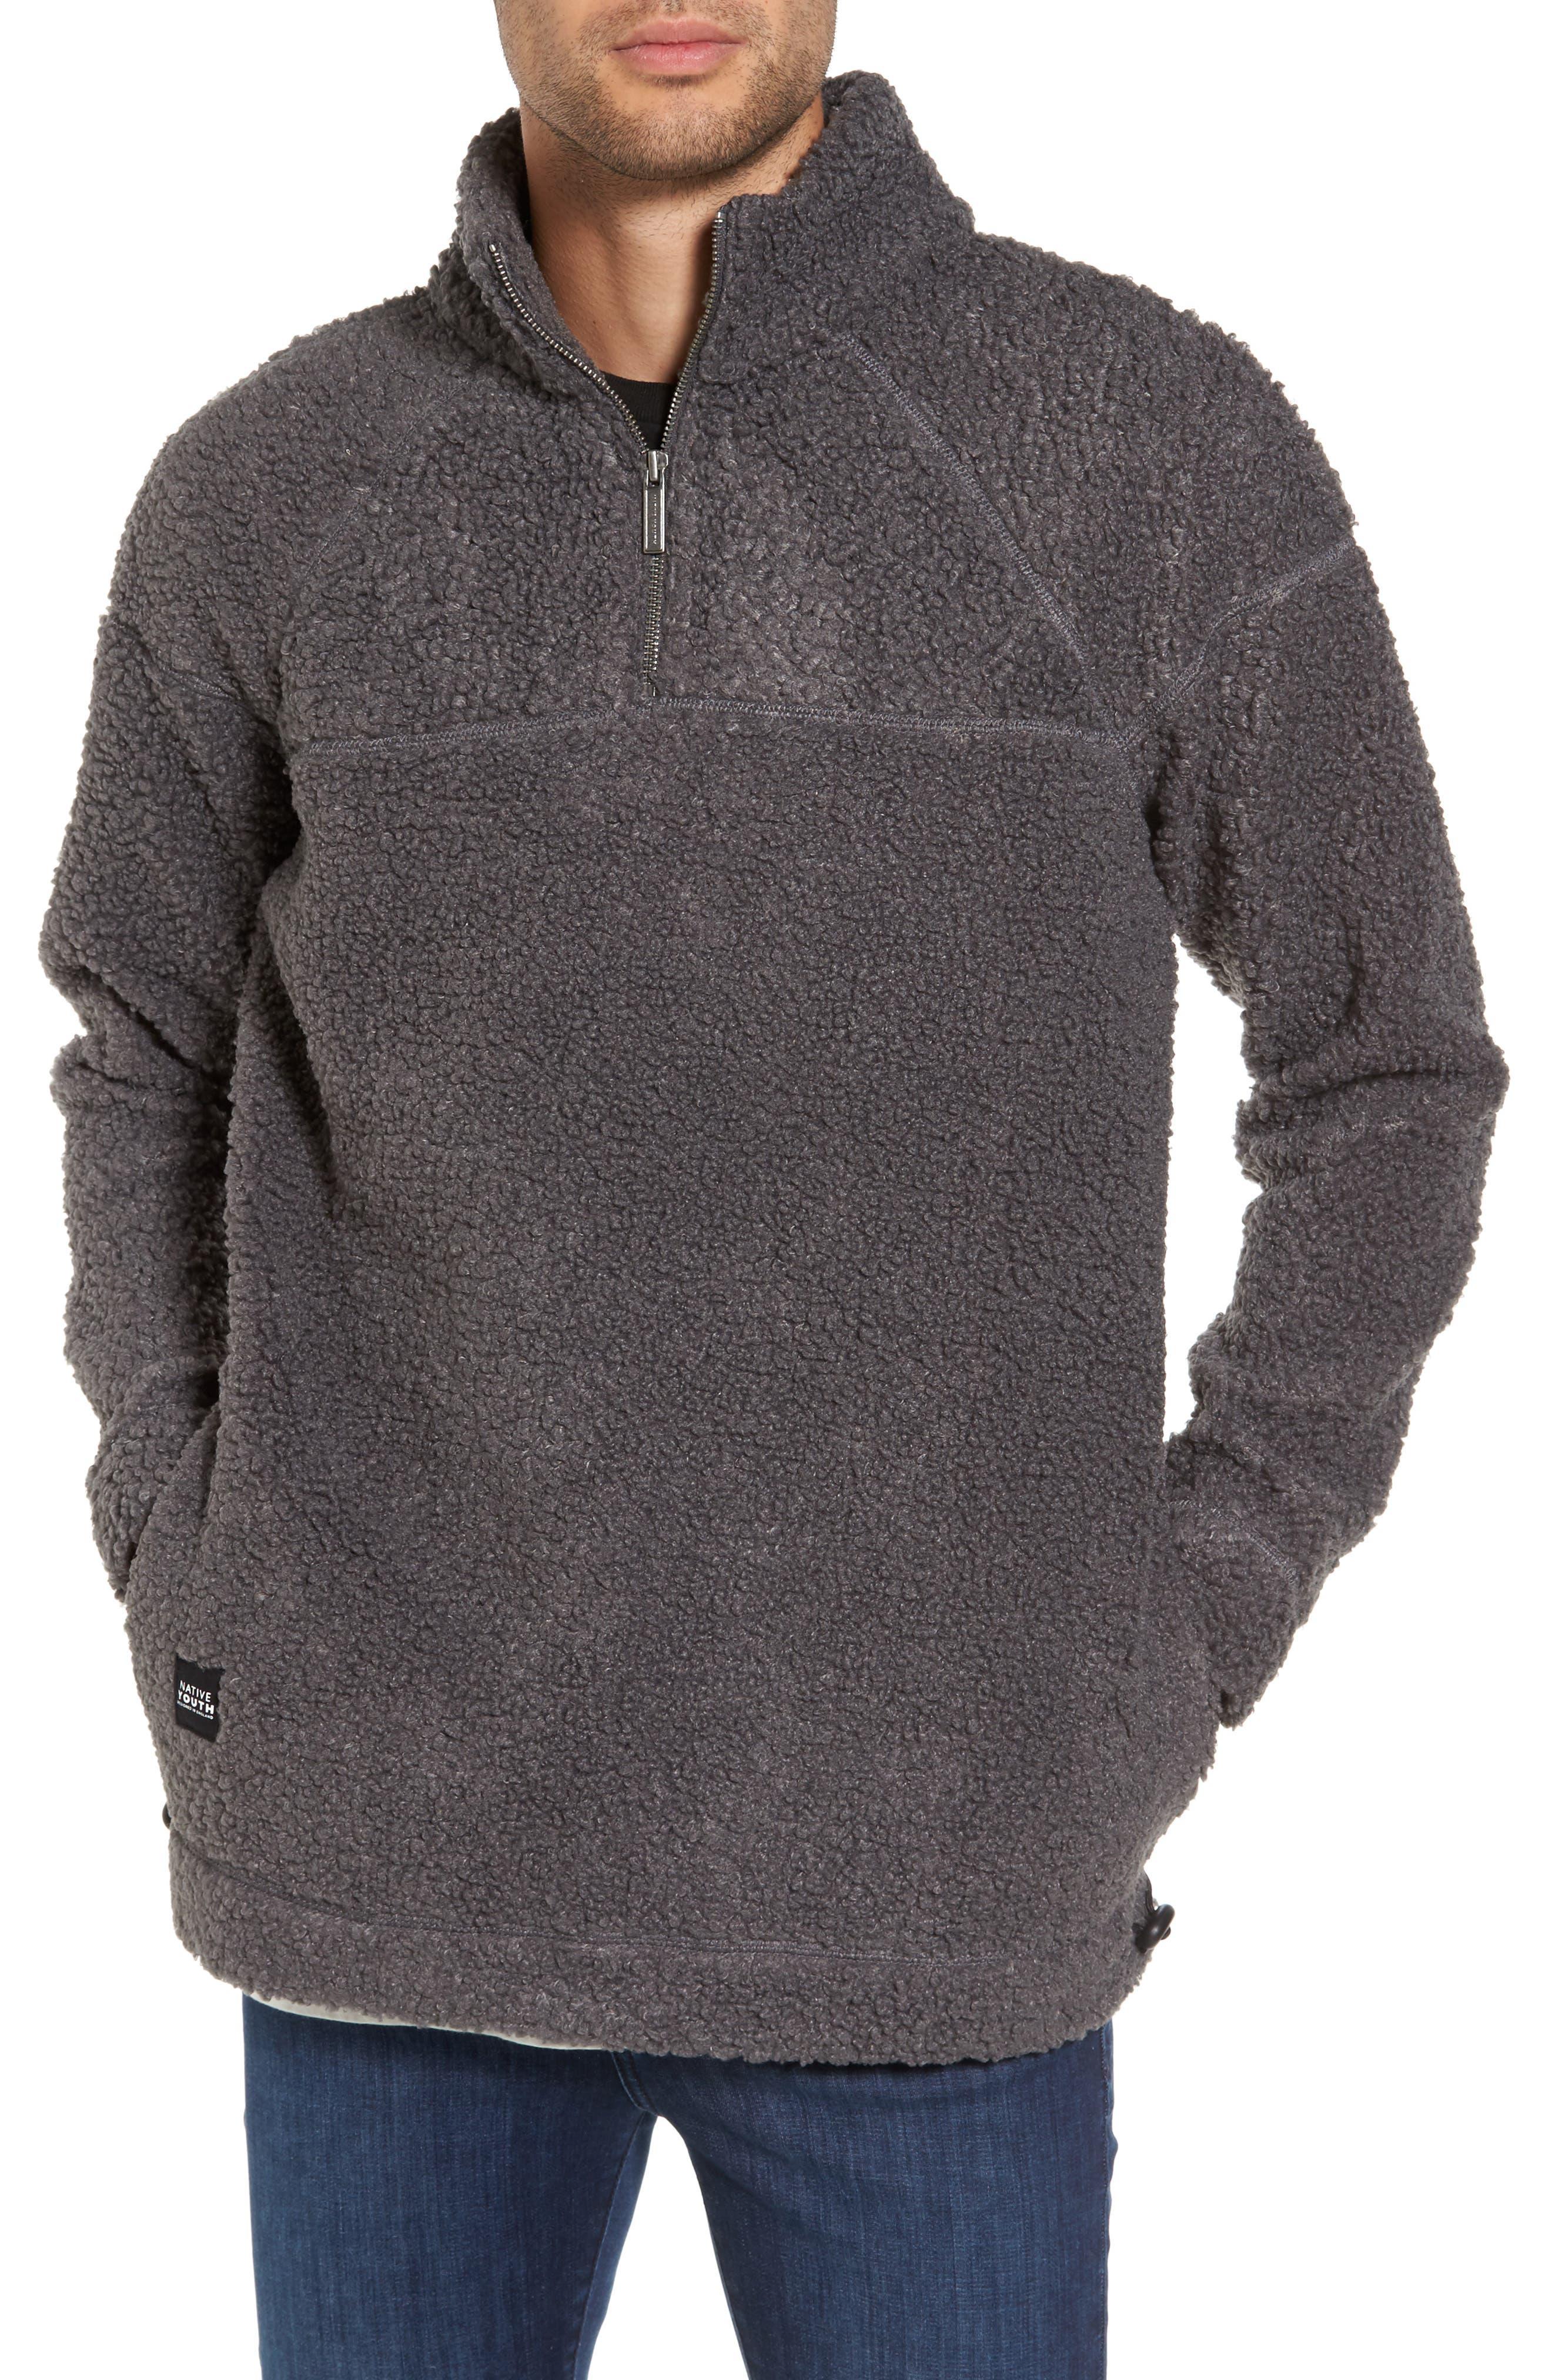 Warlock Faux Shearling Quarter Zip Sweater,                             Main thumbnail 1, color,